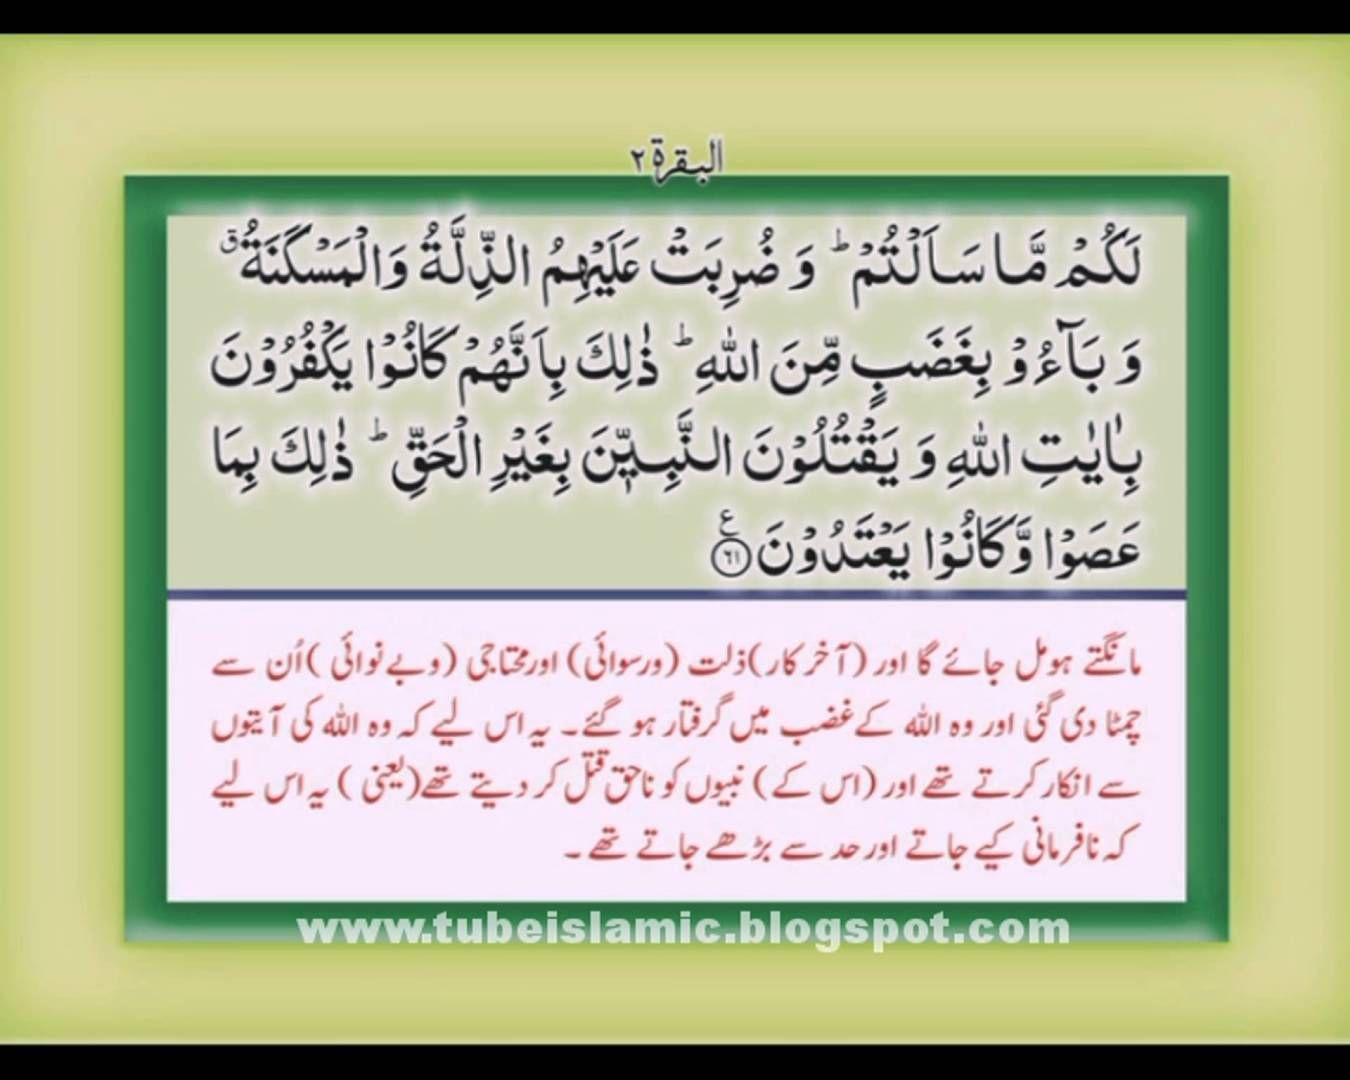 Full Tilawat Quran With Urdu Translation  Chapter 1  Alif Laam Meem